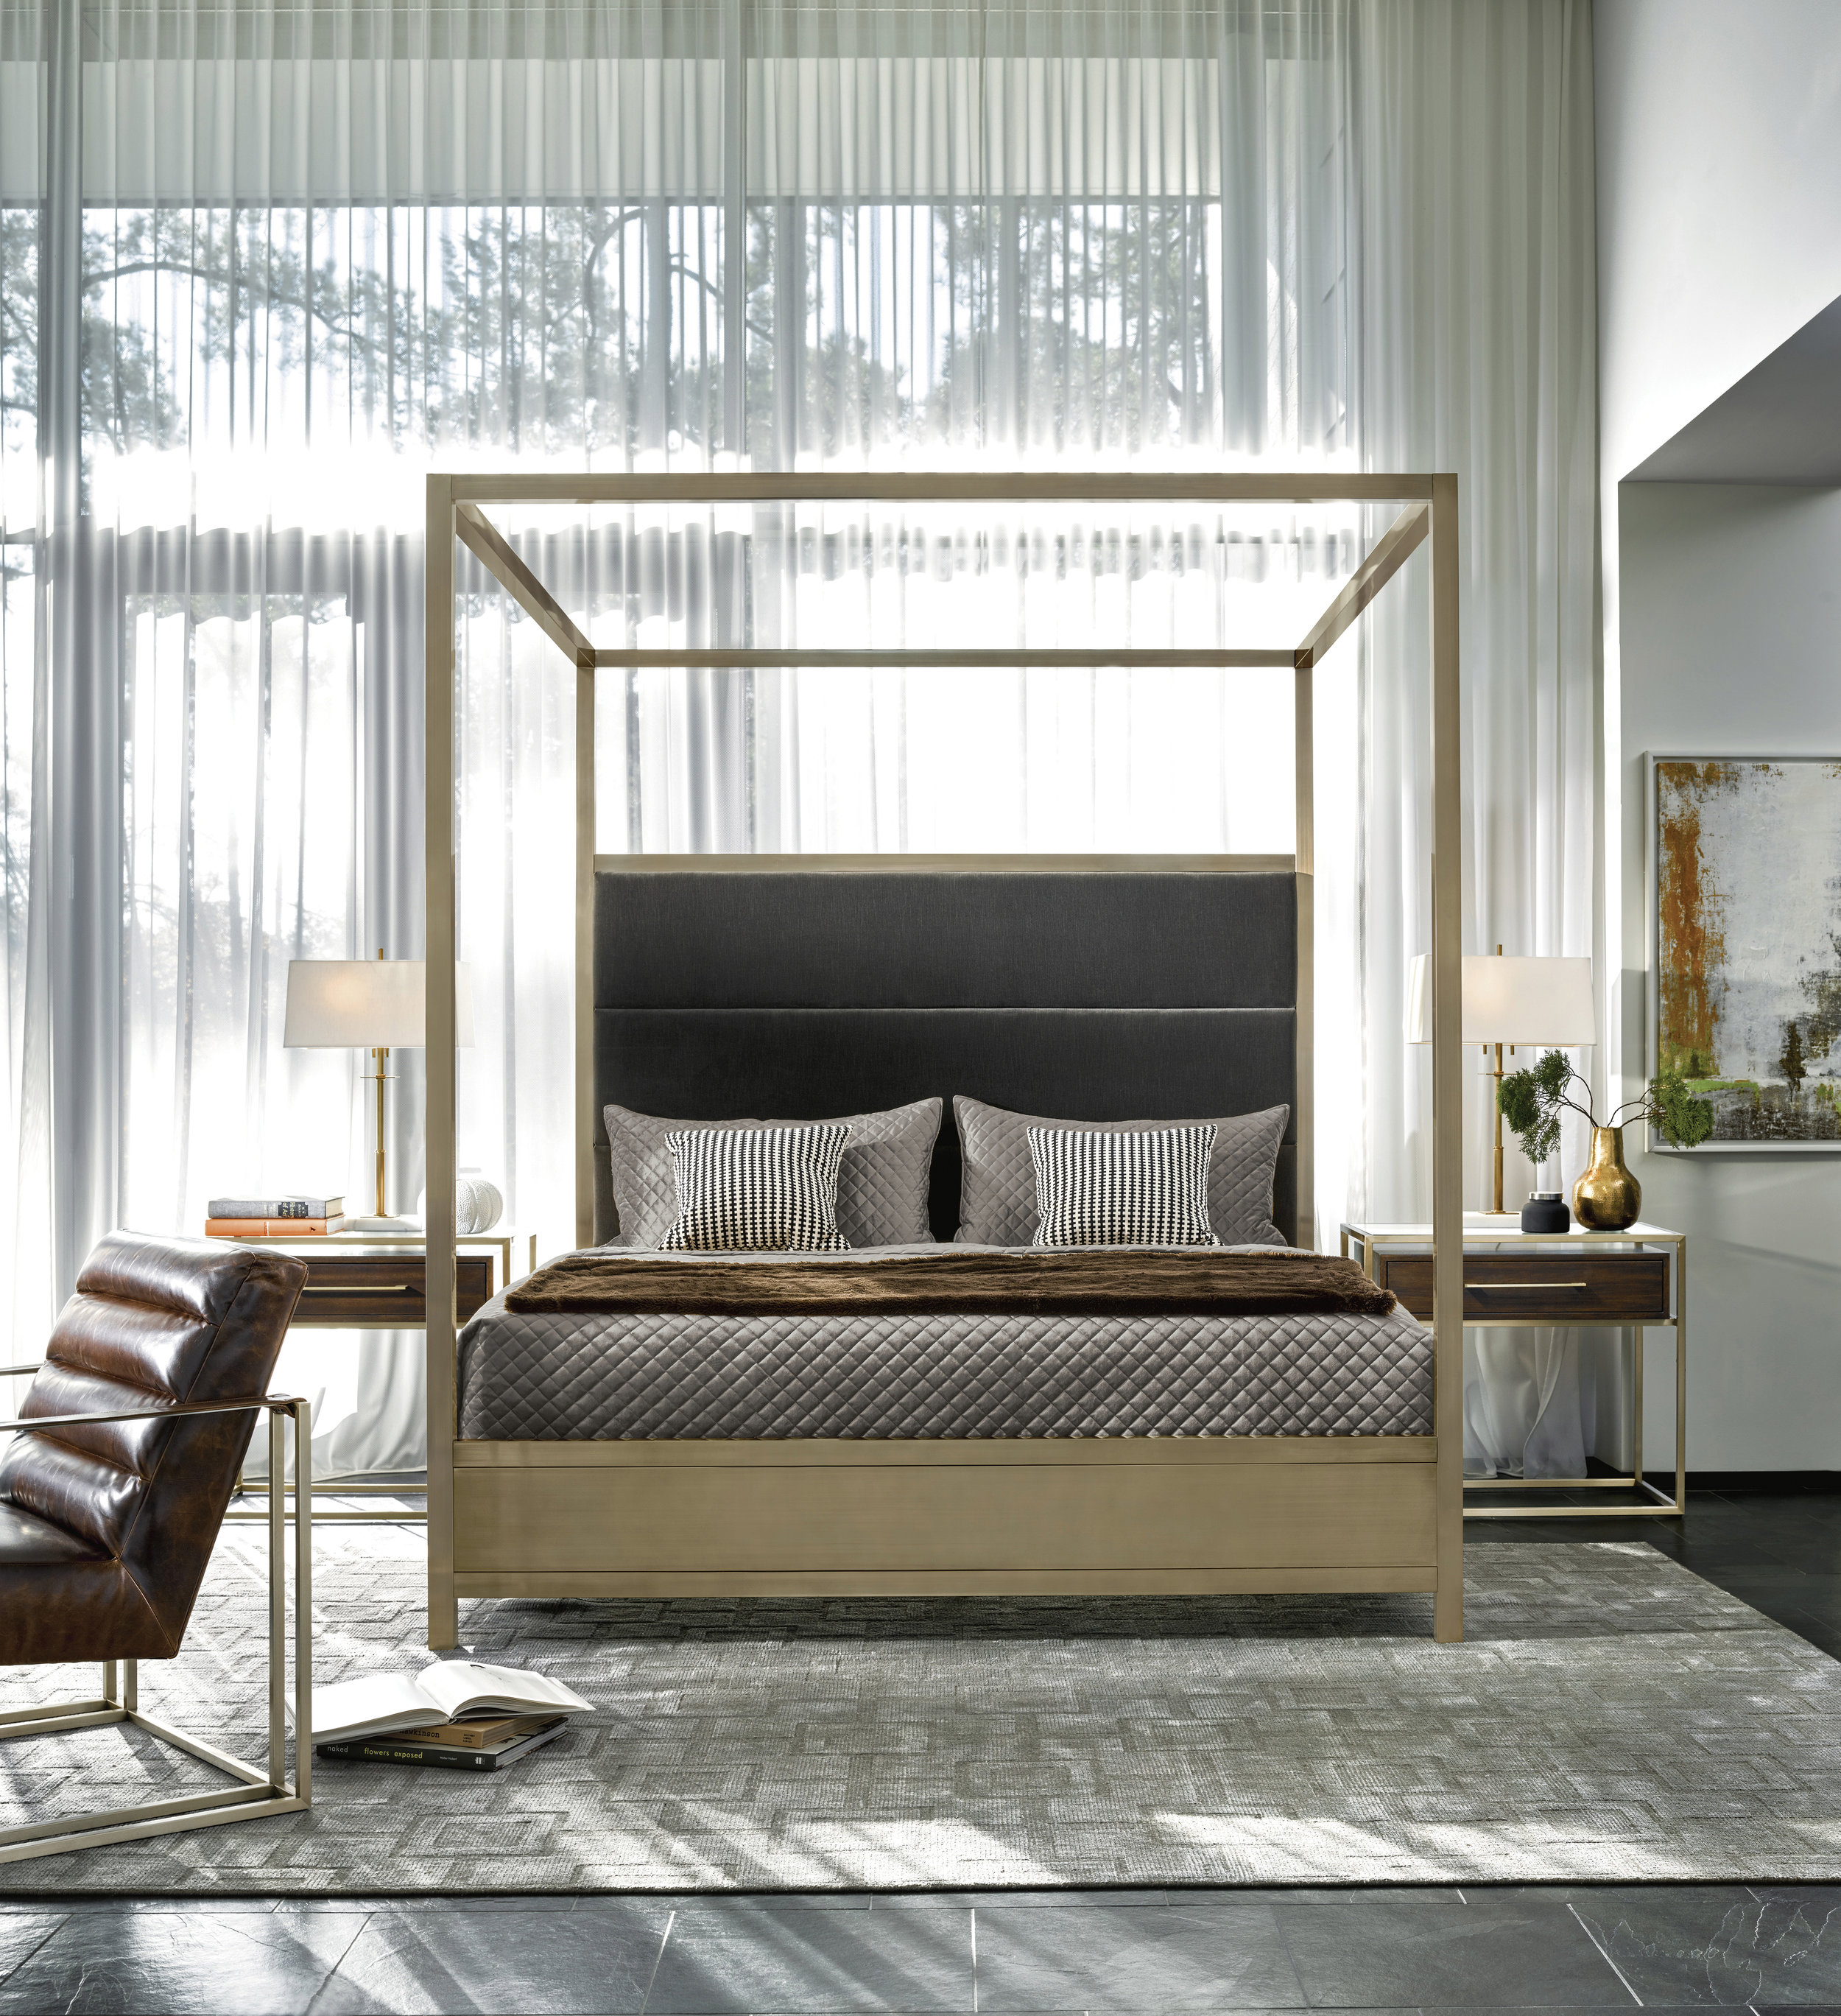 Universal Modern Bedroom-sml.jpg